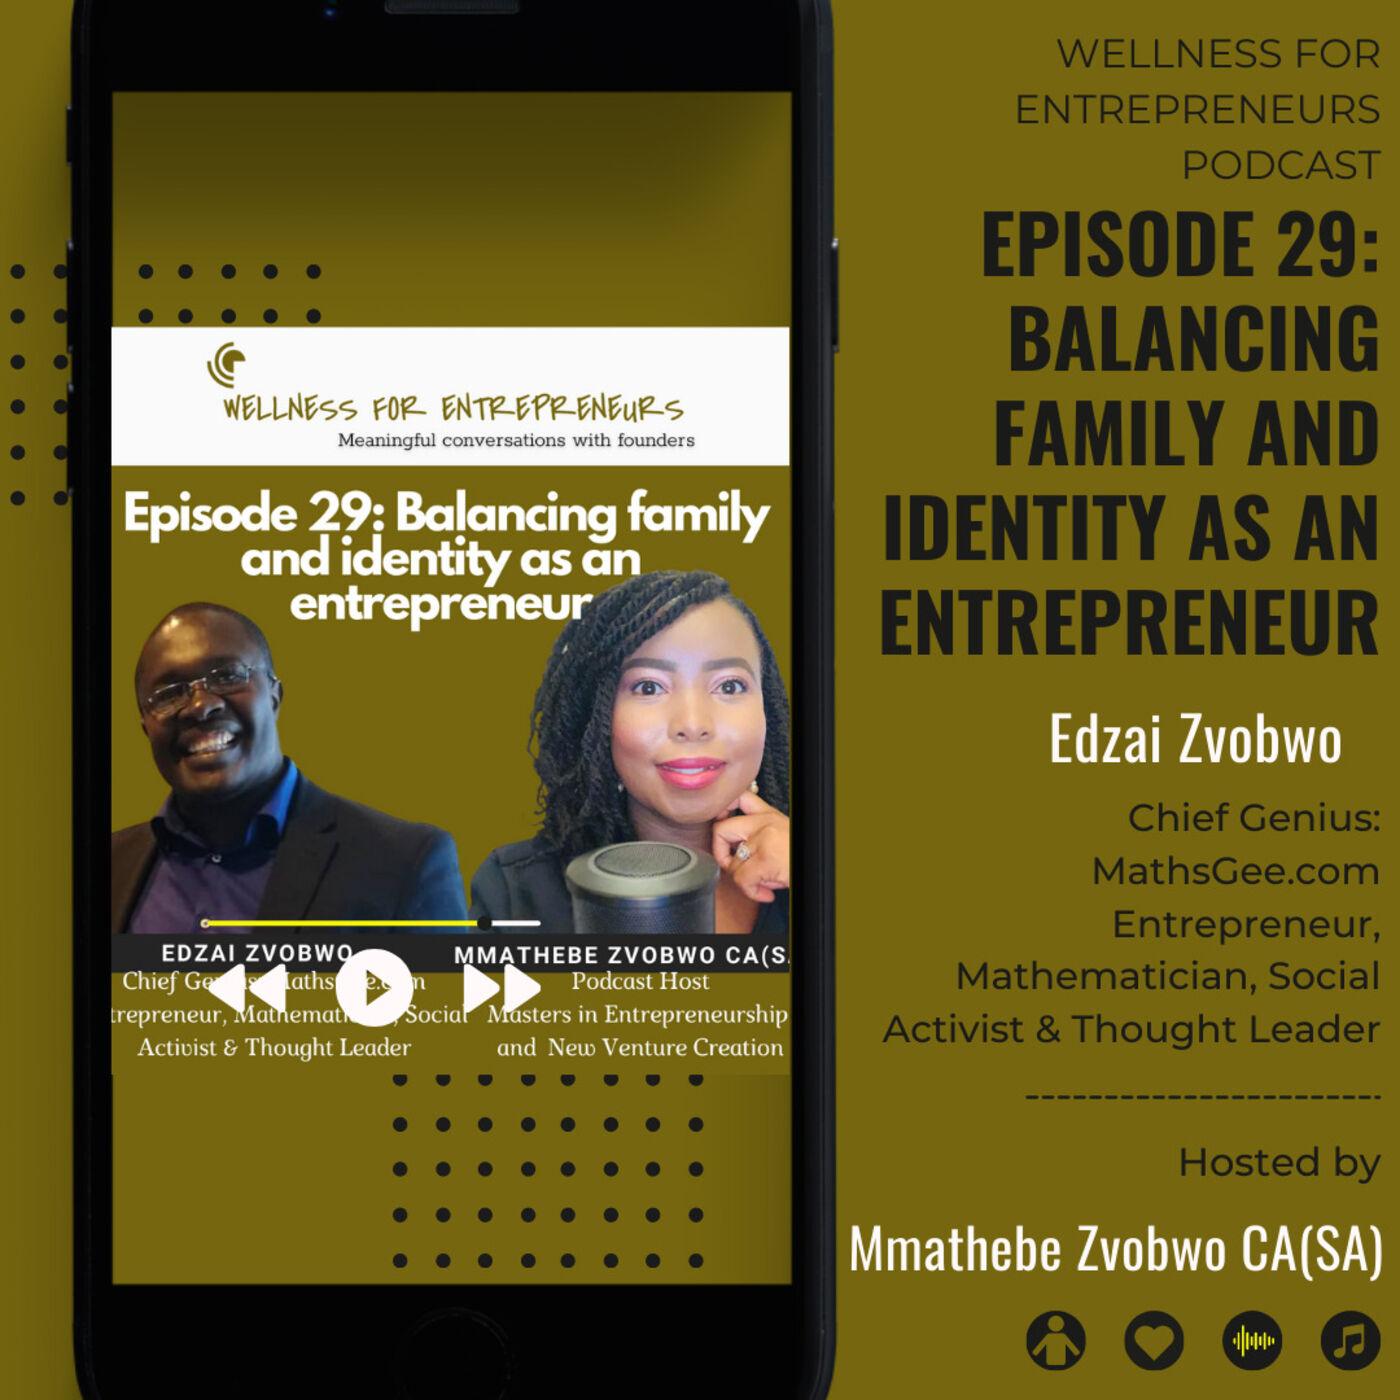 Episode 29: Balancing family and identity as an entrepreneur, with Edzai Zvobwo